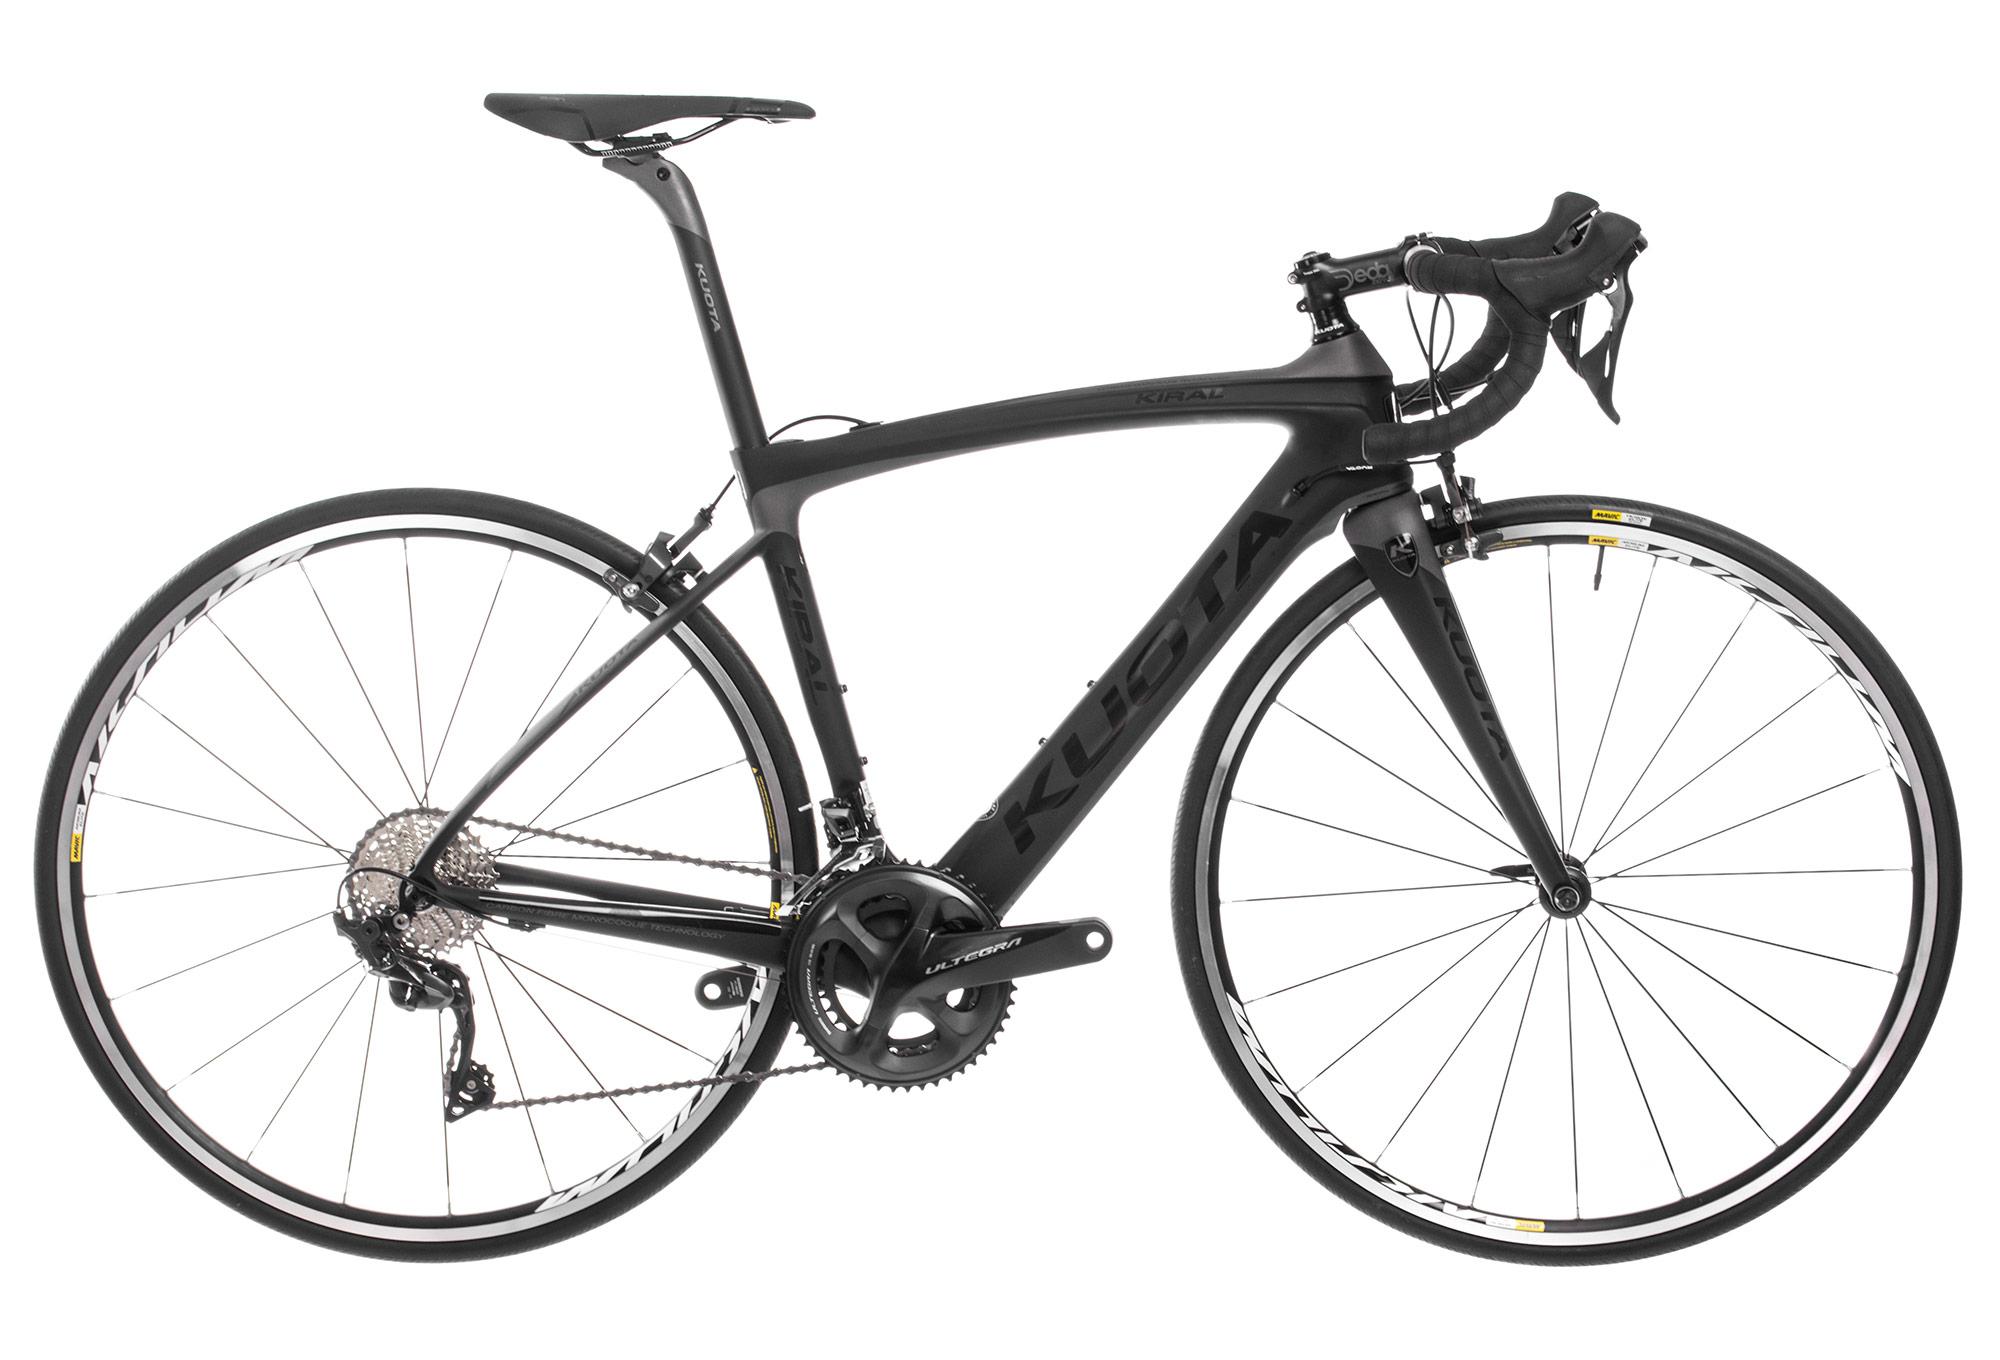 Road Bike Kuota 2018 Kiral Shimano Ultegra 11s Black